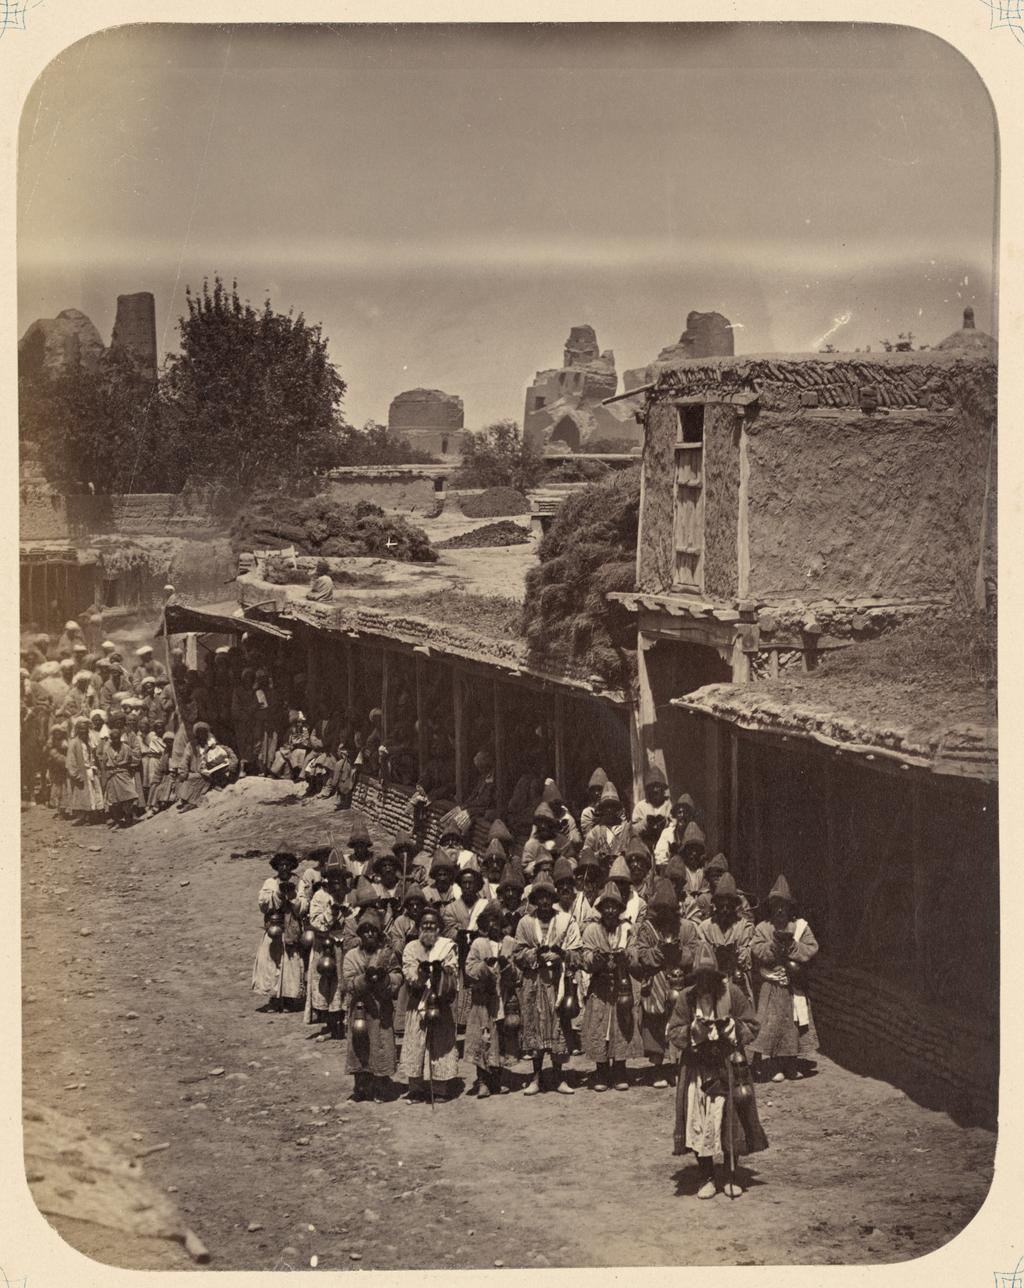 Секта каландаров. Каландары, просящие милостыню на улице